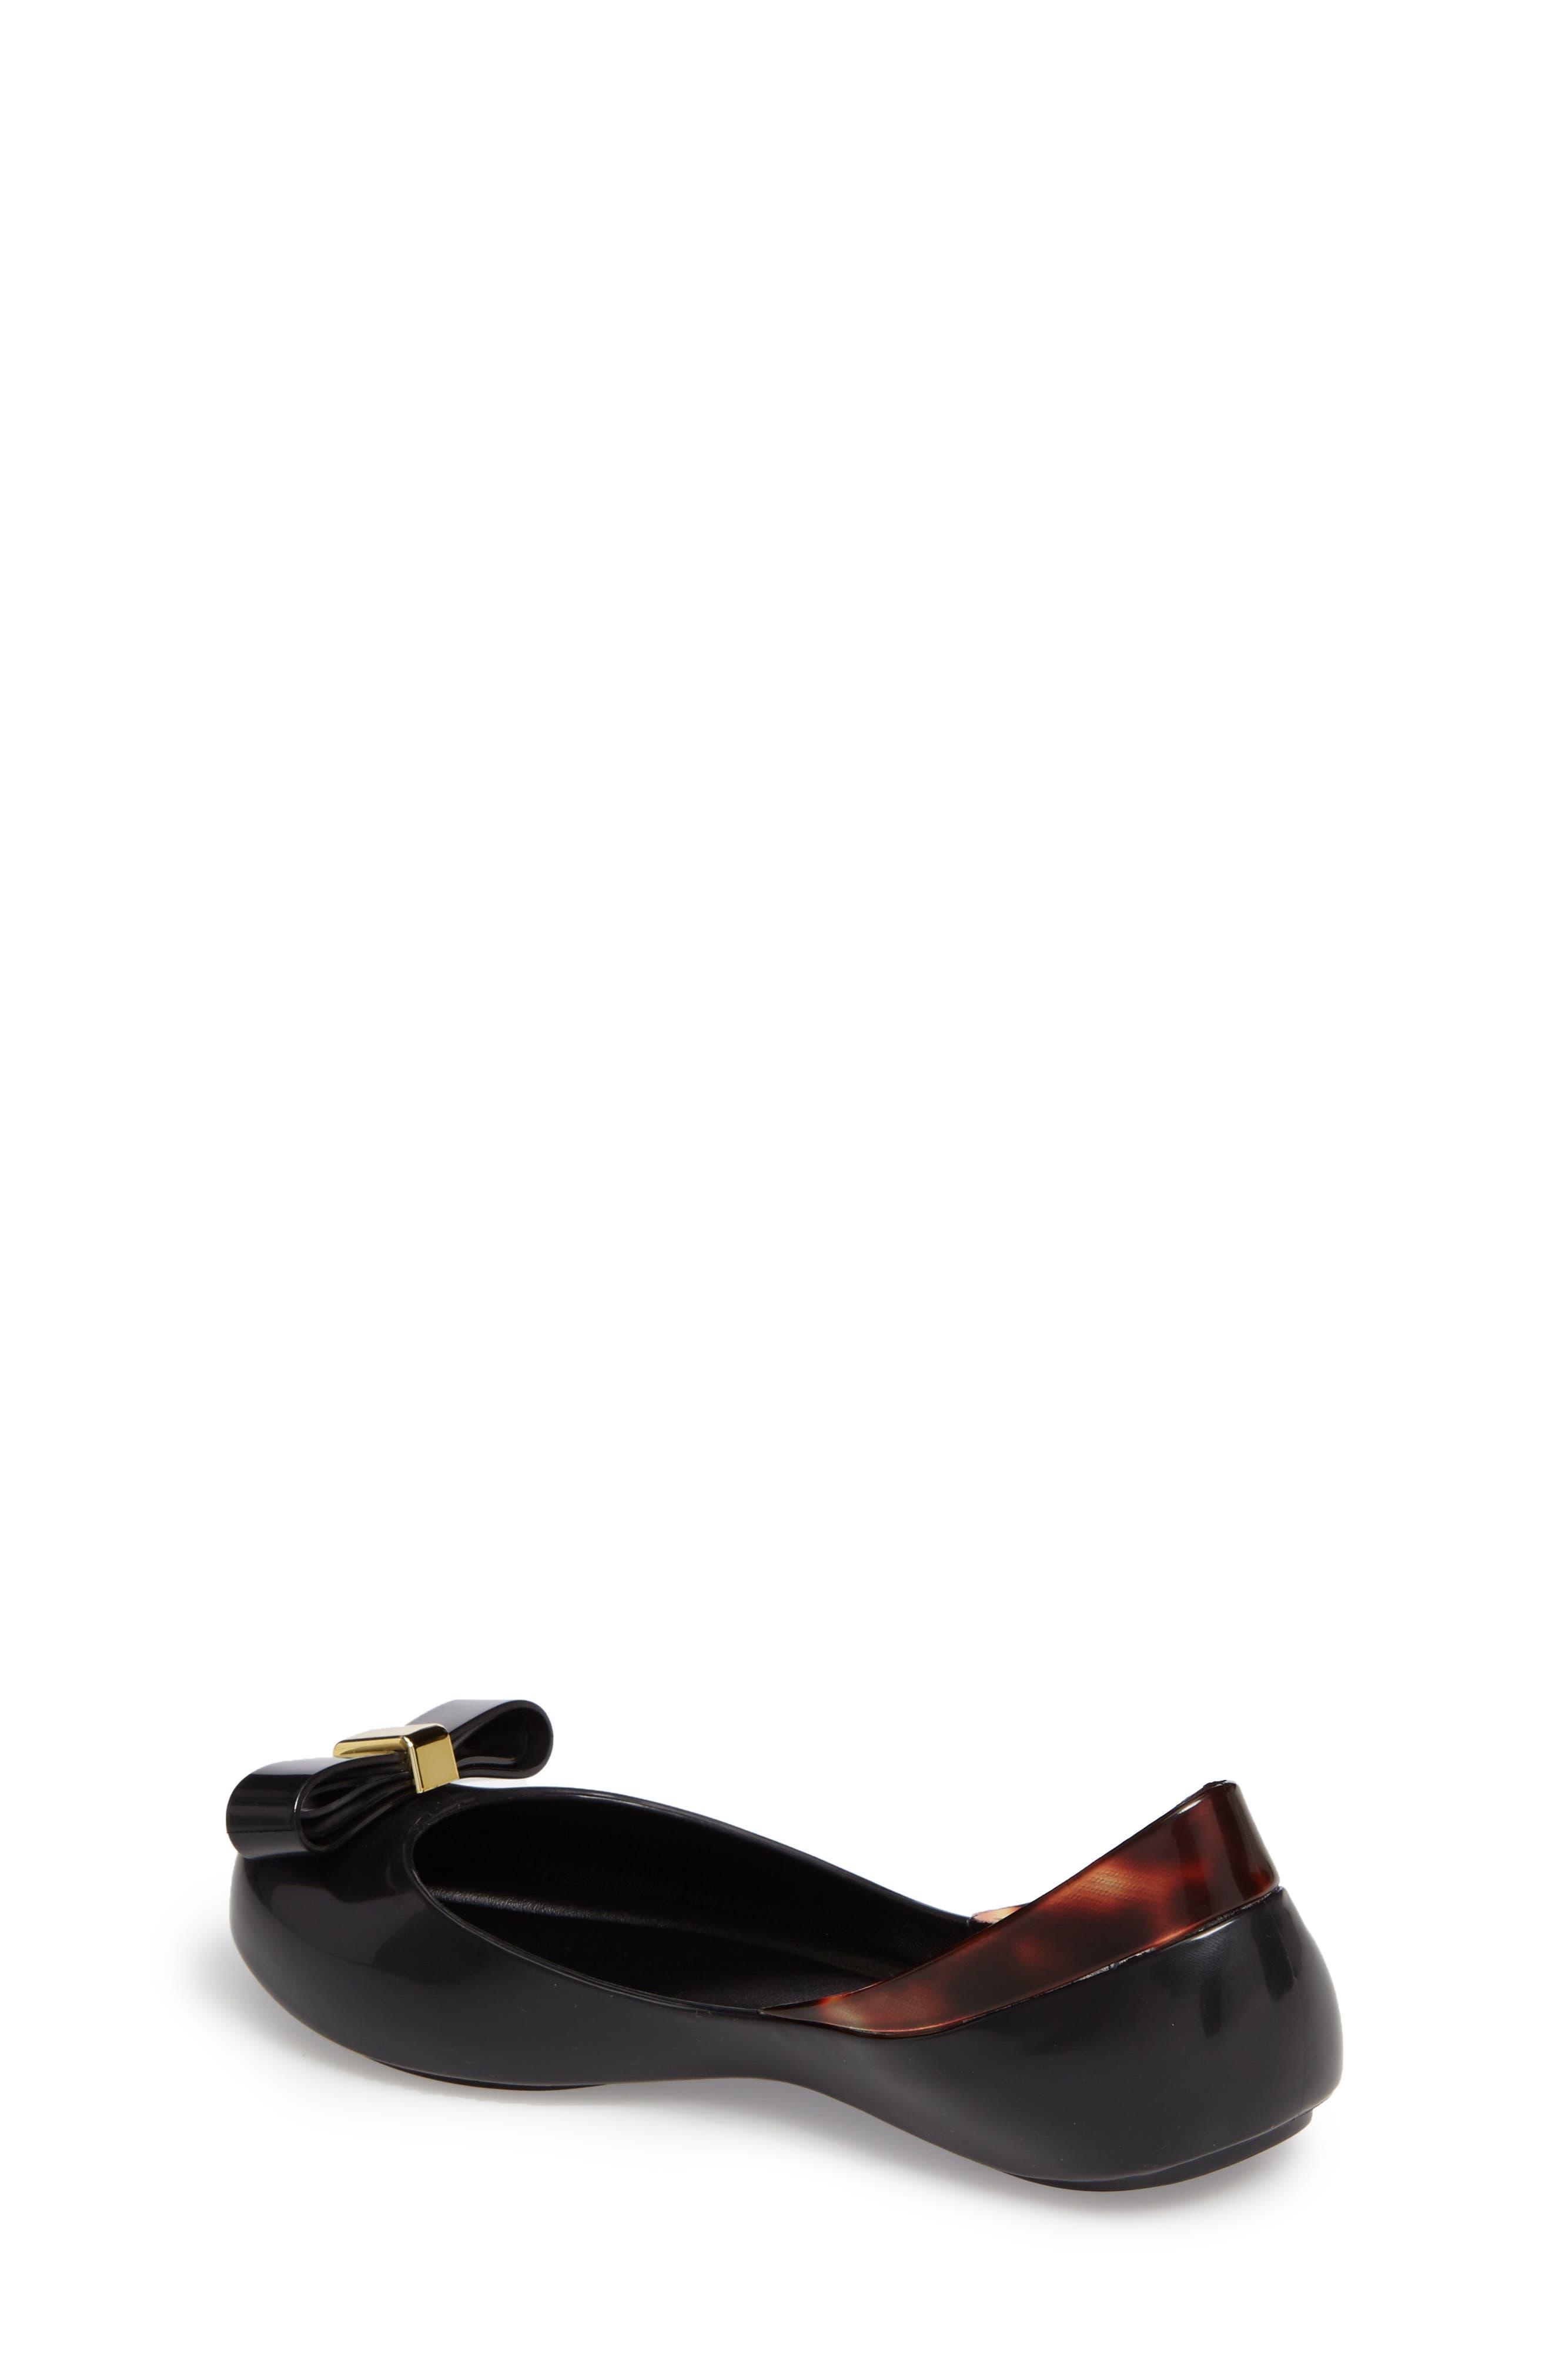 Queen III Peep Toe Flat,                             Alternate thumbnail 2, color,                             001